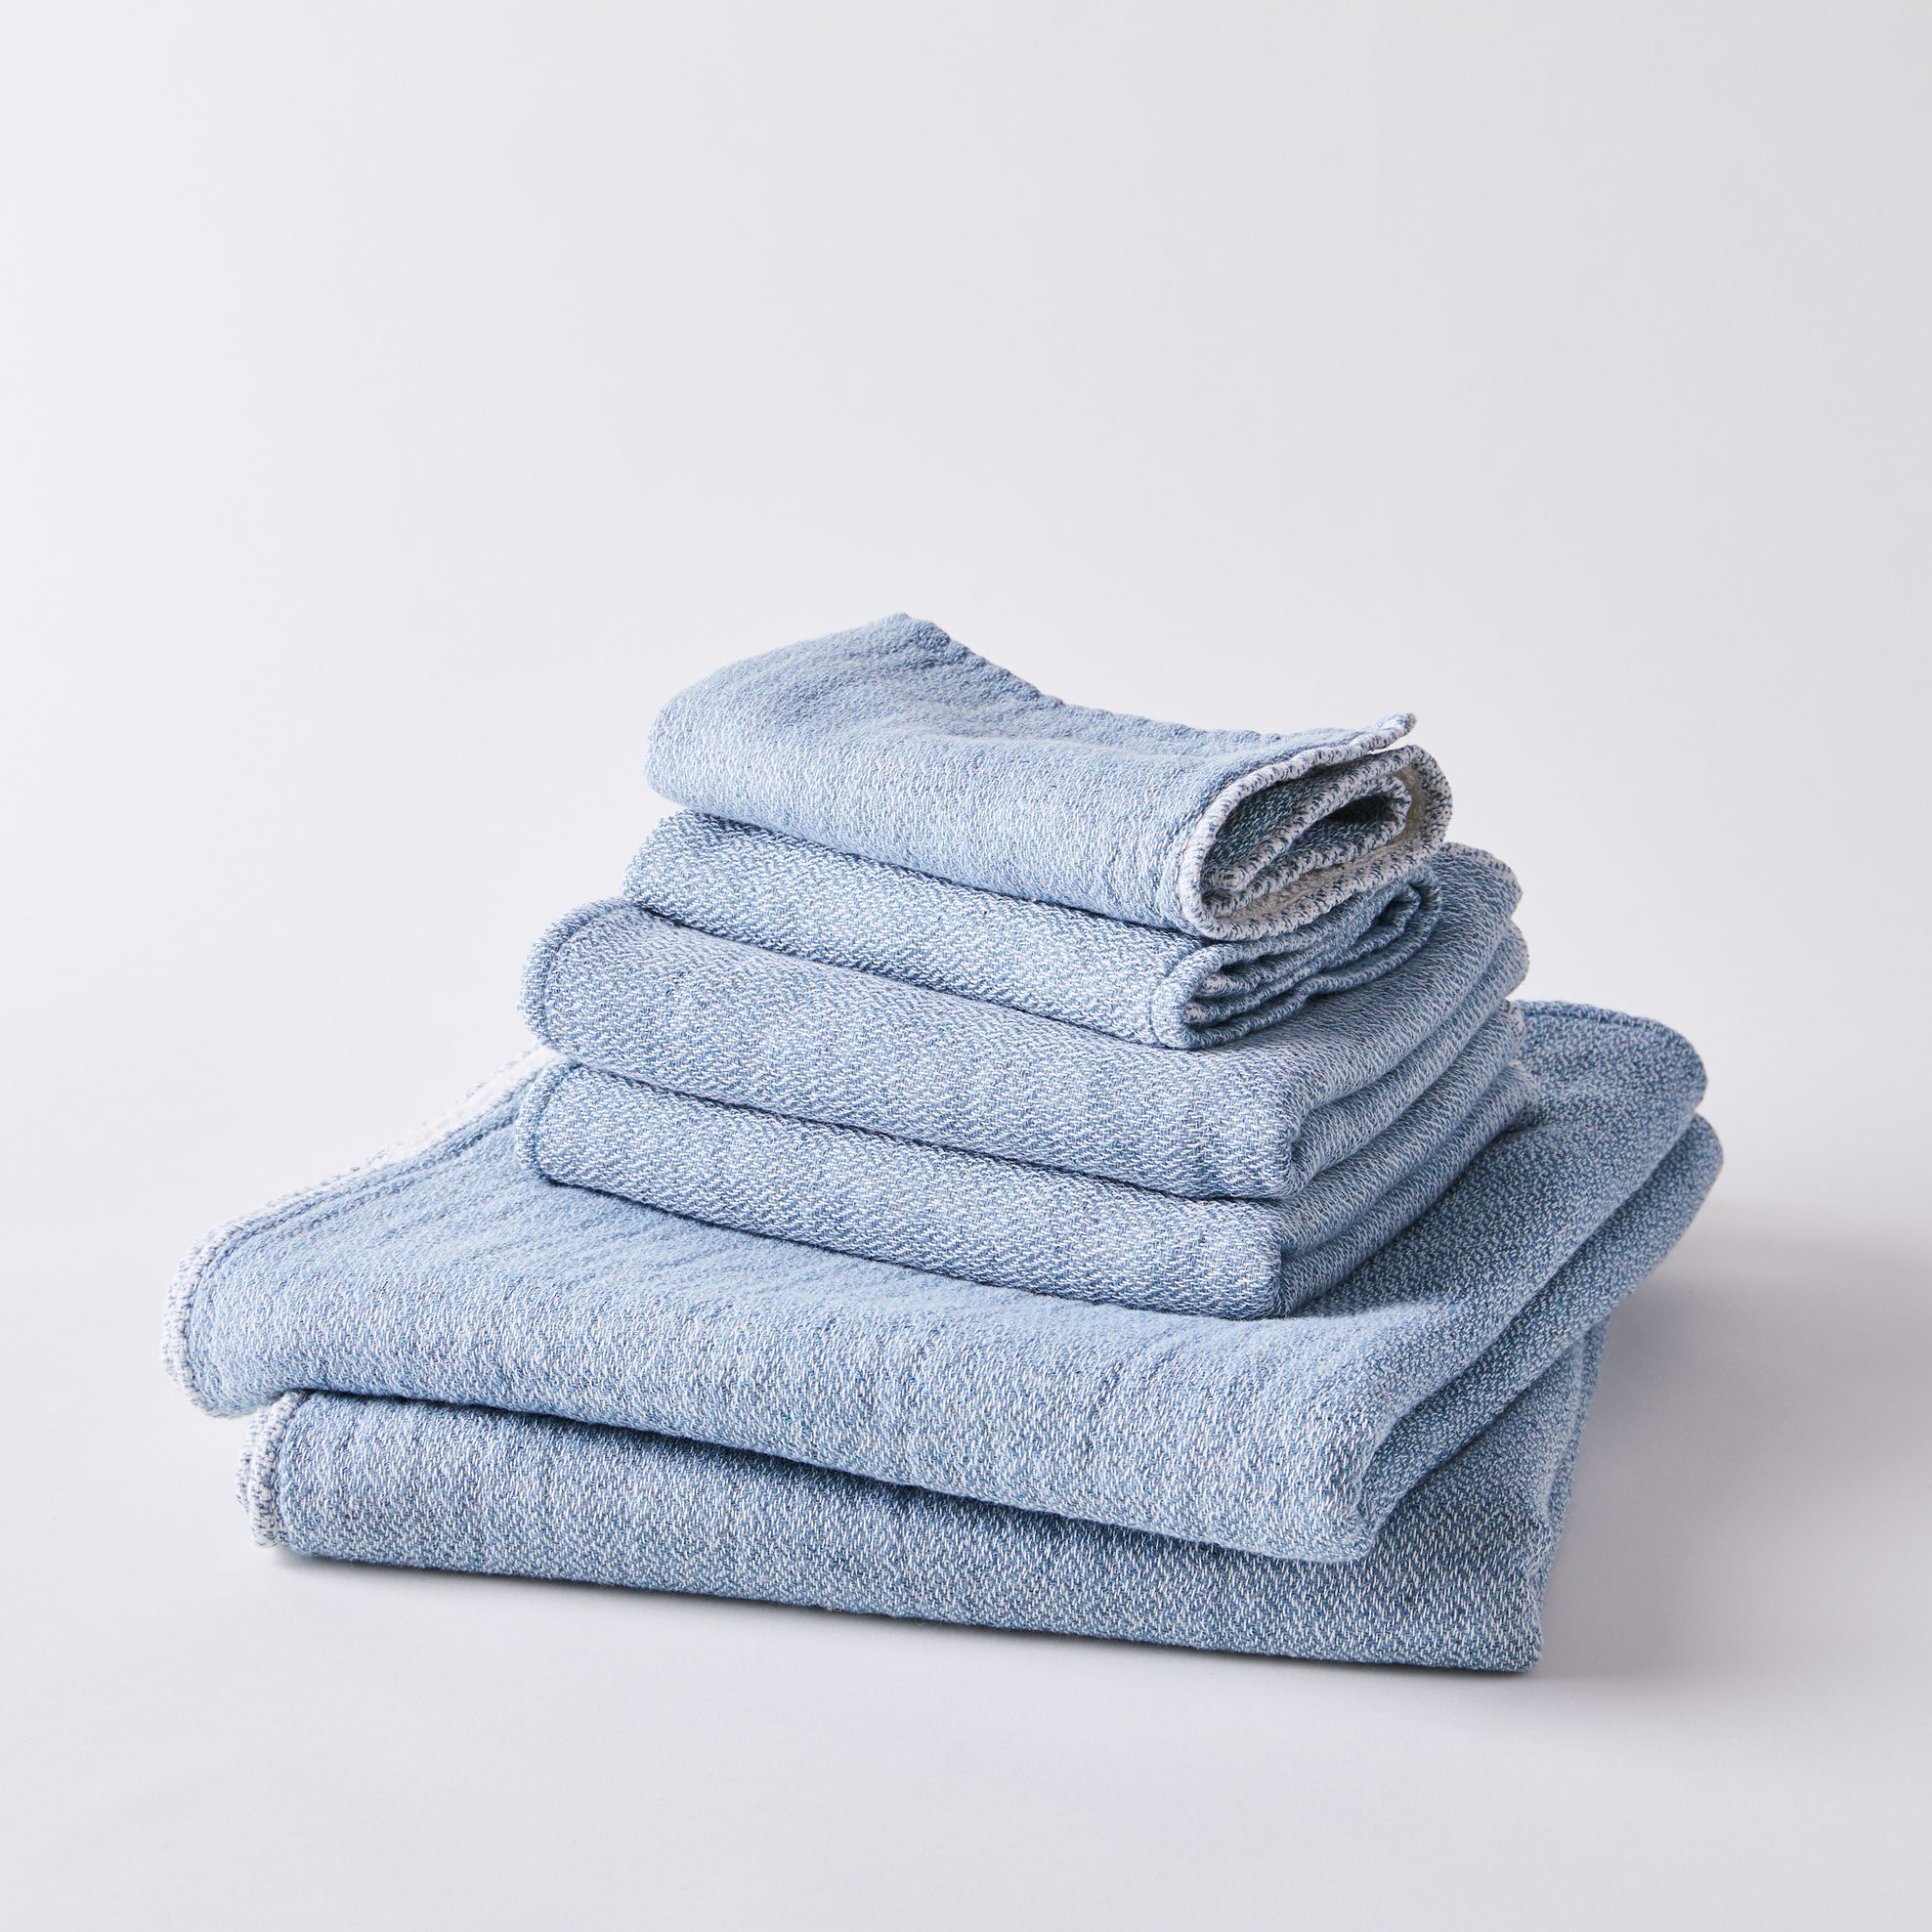 Towels by Fran Sharples